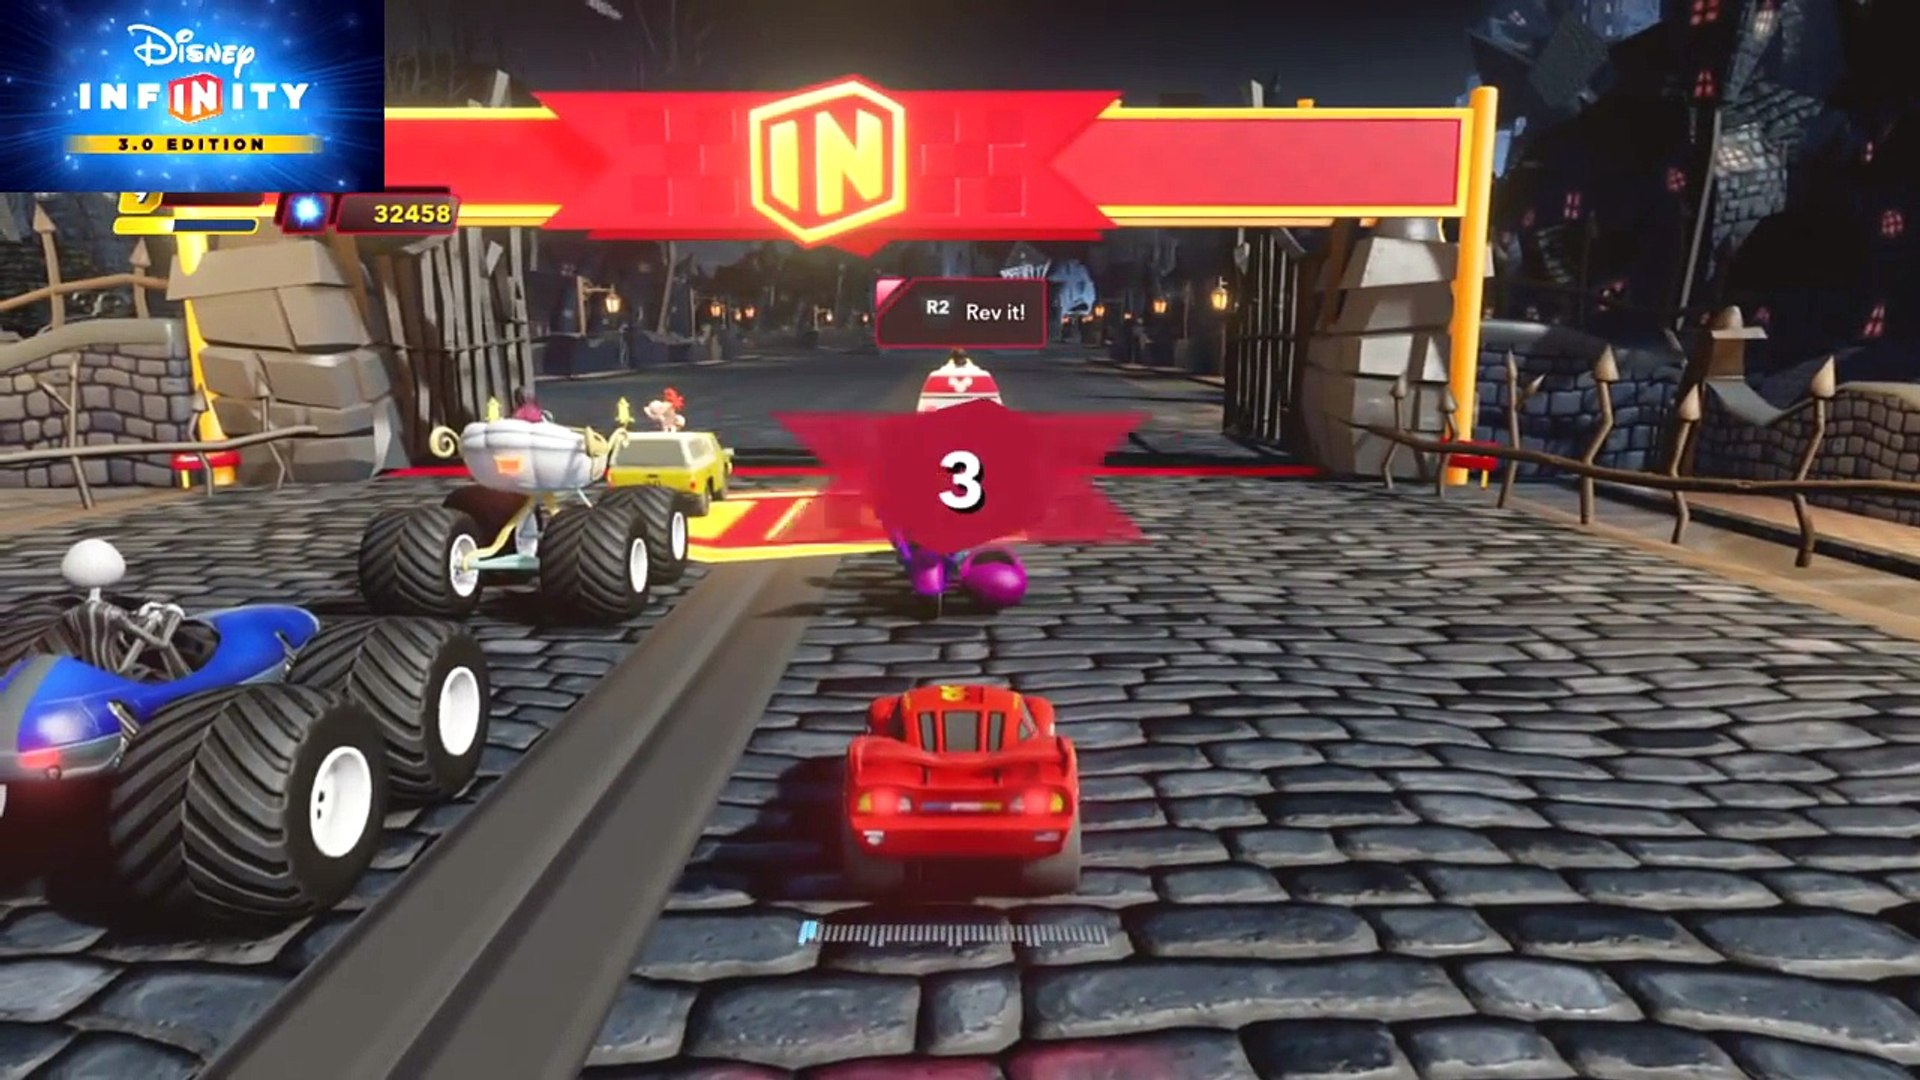 Cars Movie Games - Cars 3, Cars 2, Cars 1 Movie Games